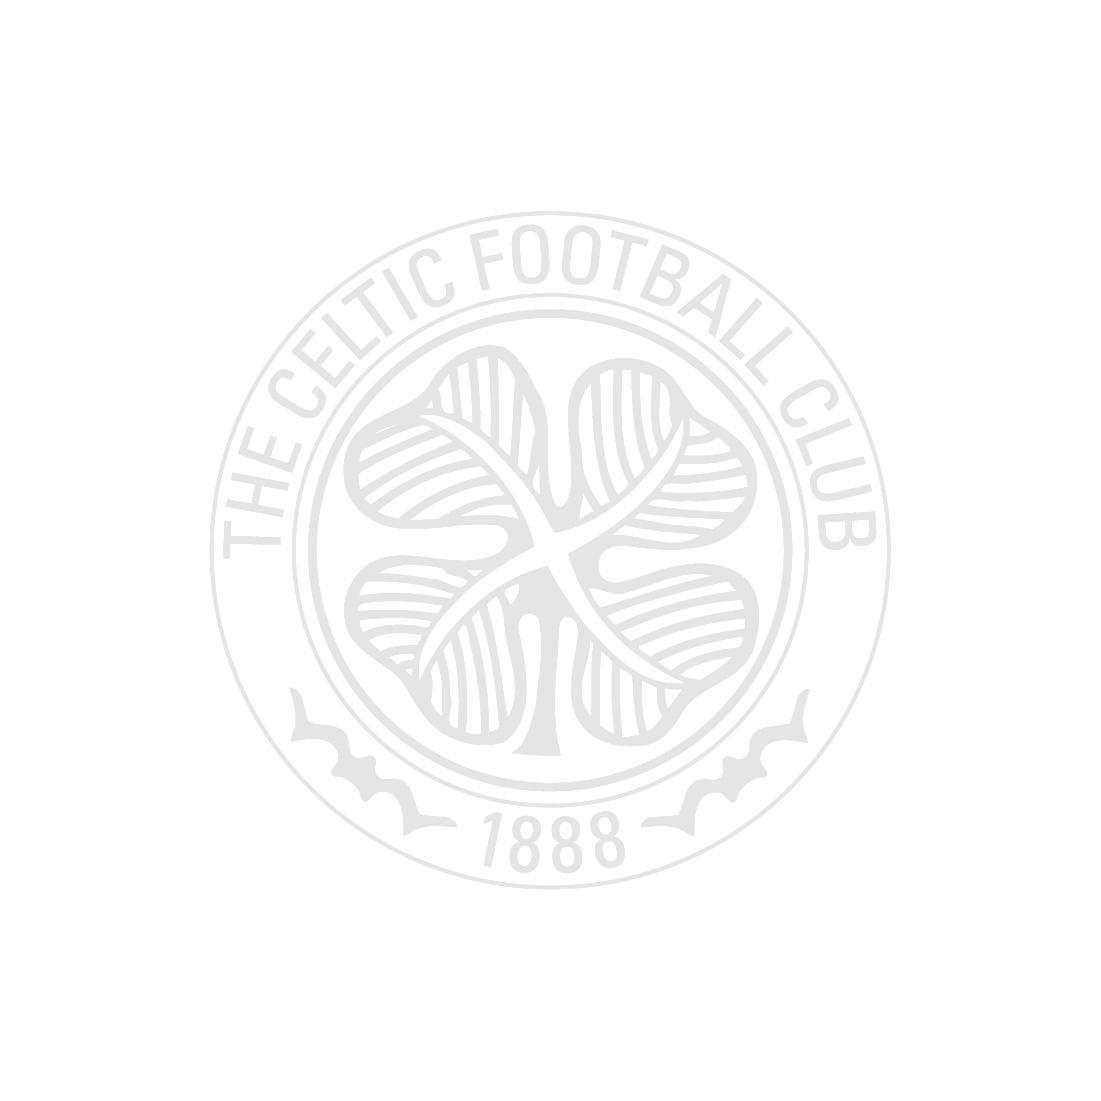 Celtic Crest Mug - The Bhoys